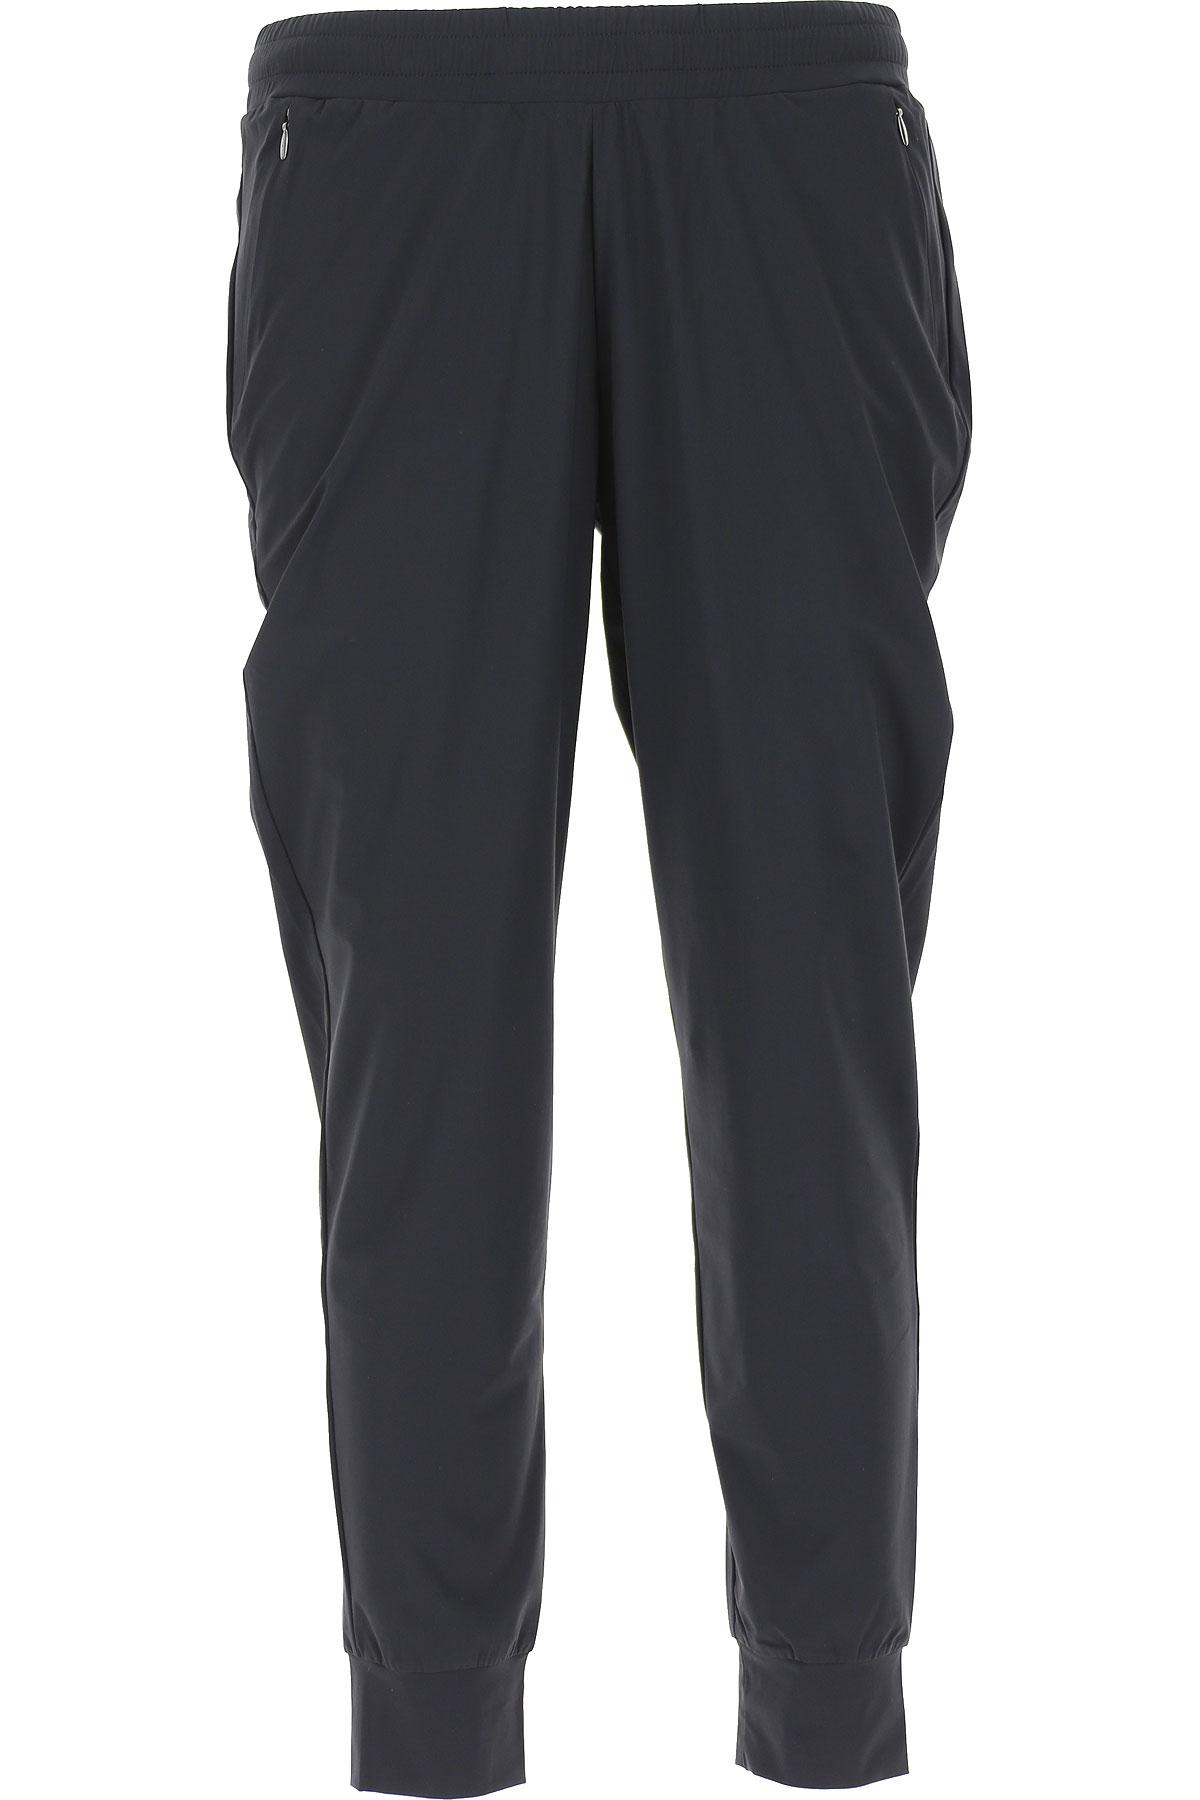 RRD Pantalon Homme, Bleu marine, Polyamide, 2017, 48 50 52 54